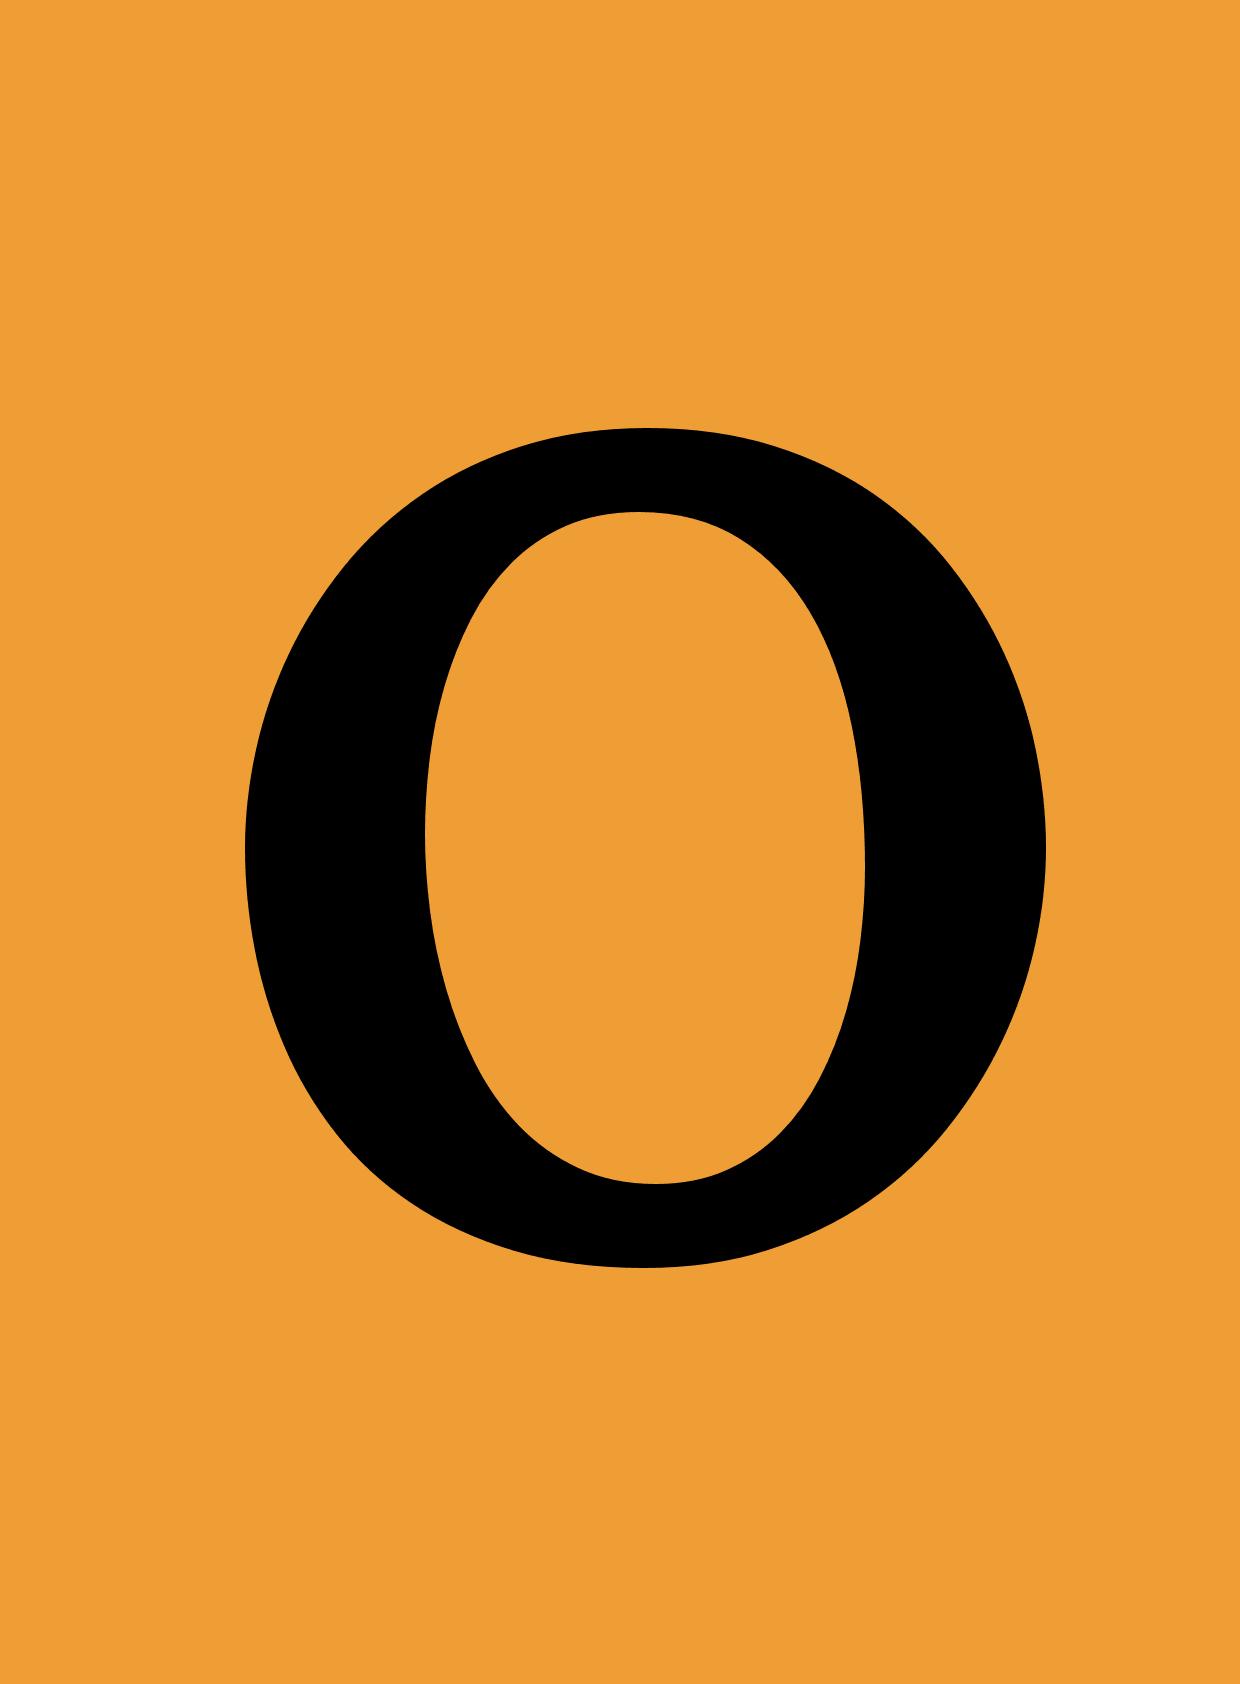 25 unique tipos de letras online ideas on pinterest for Disenos de literas